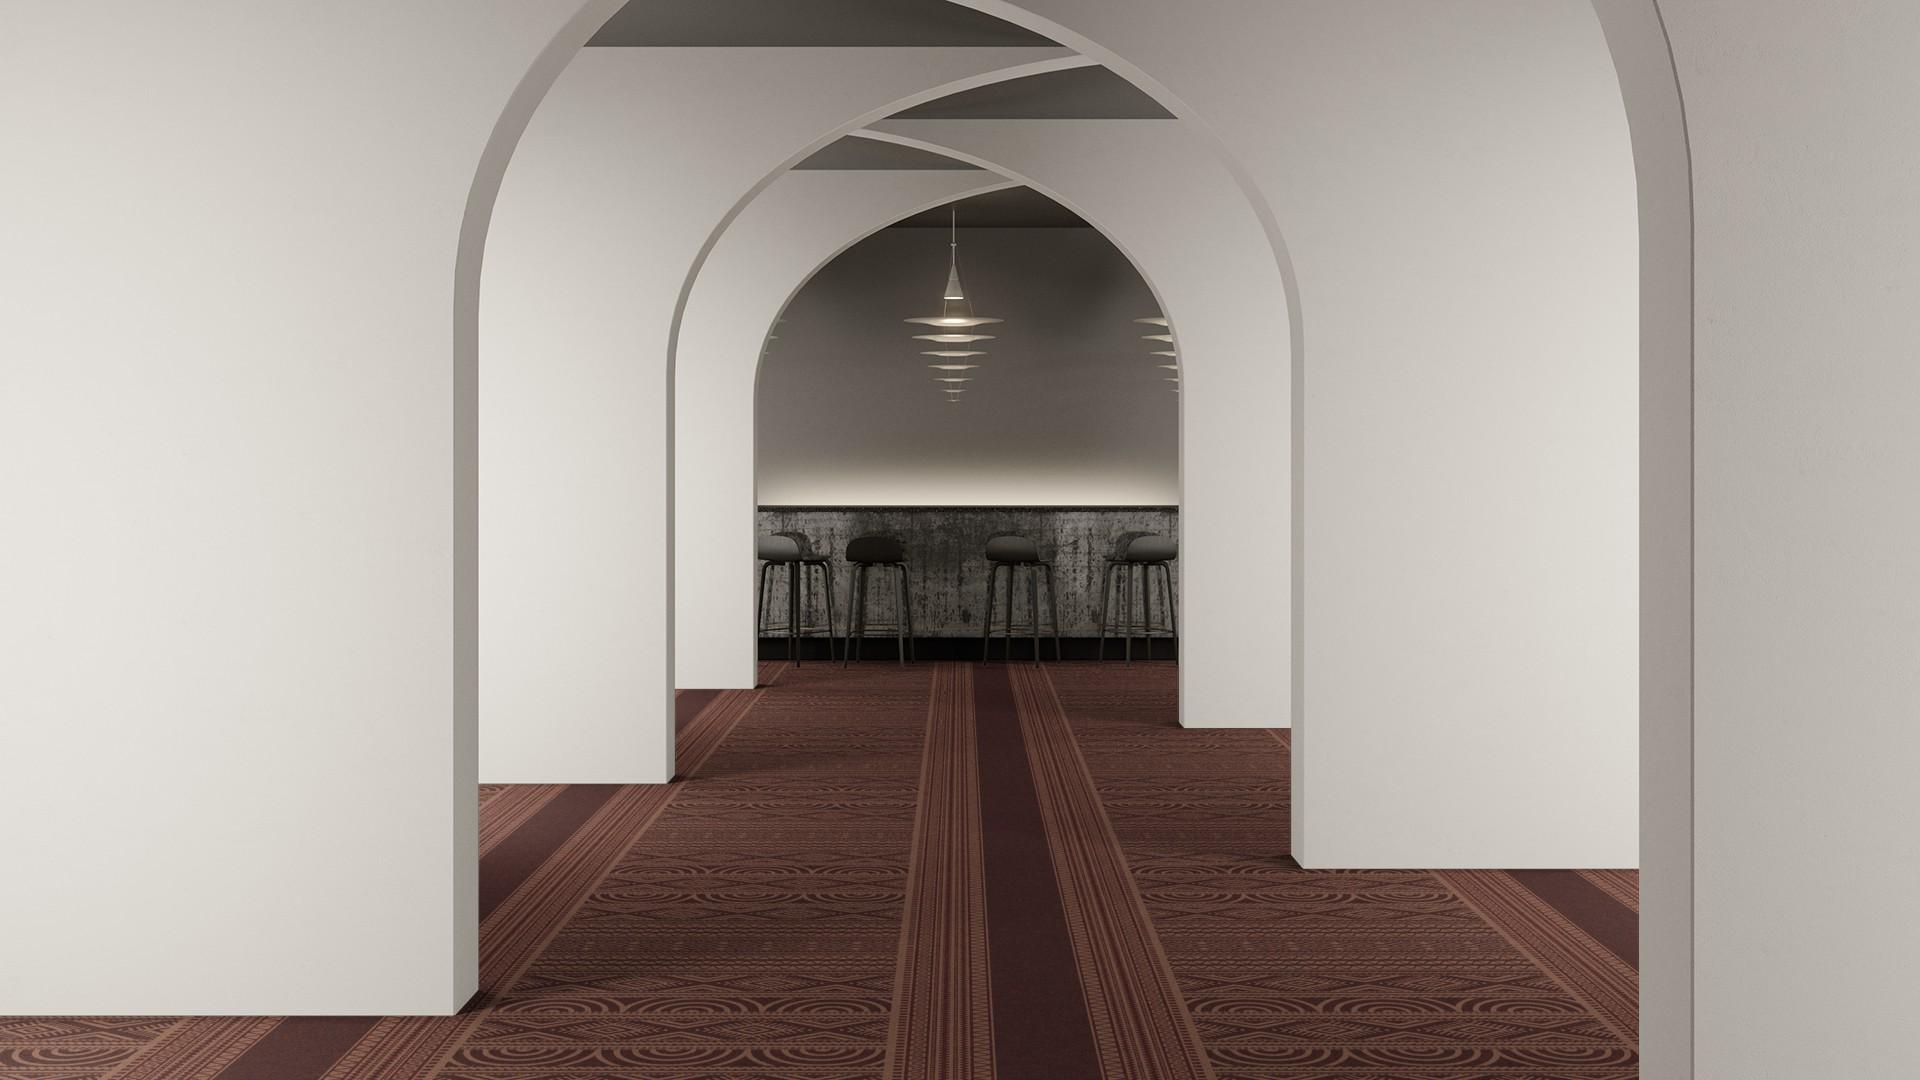 ghana corridor 195 cm red RoowView 2